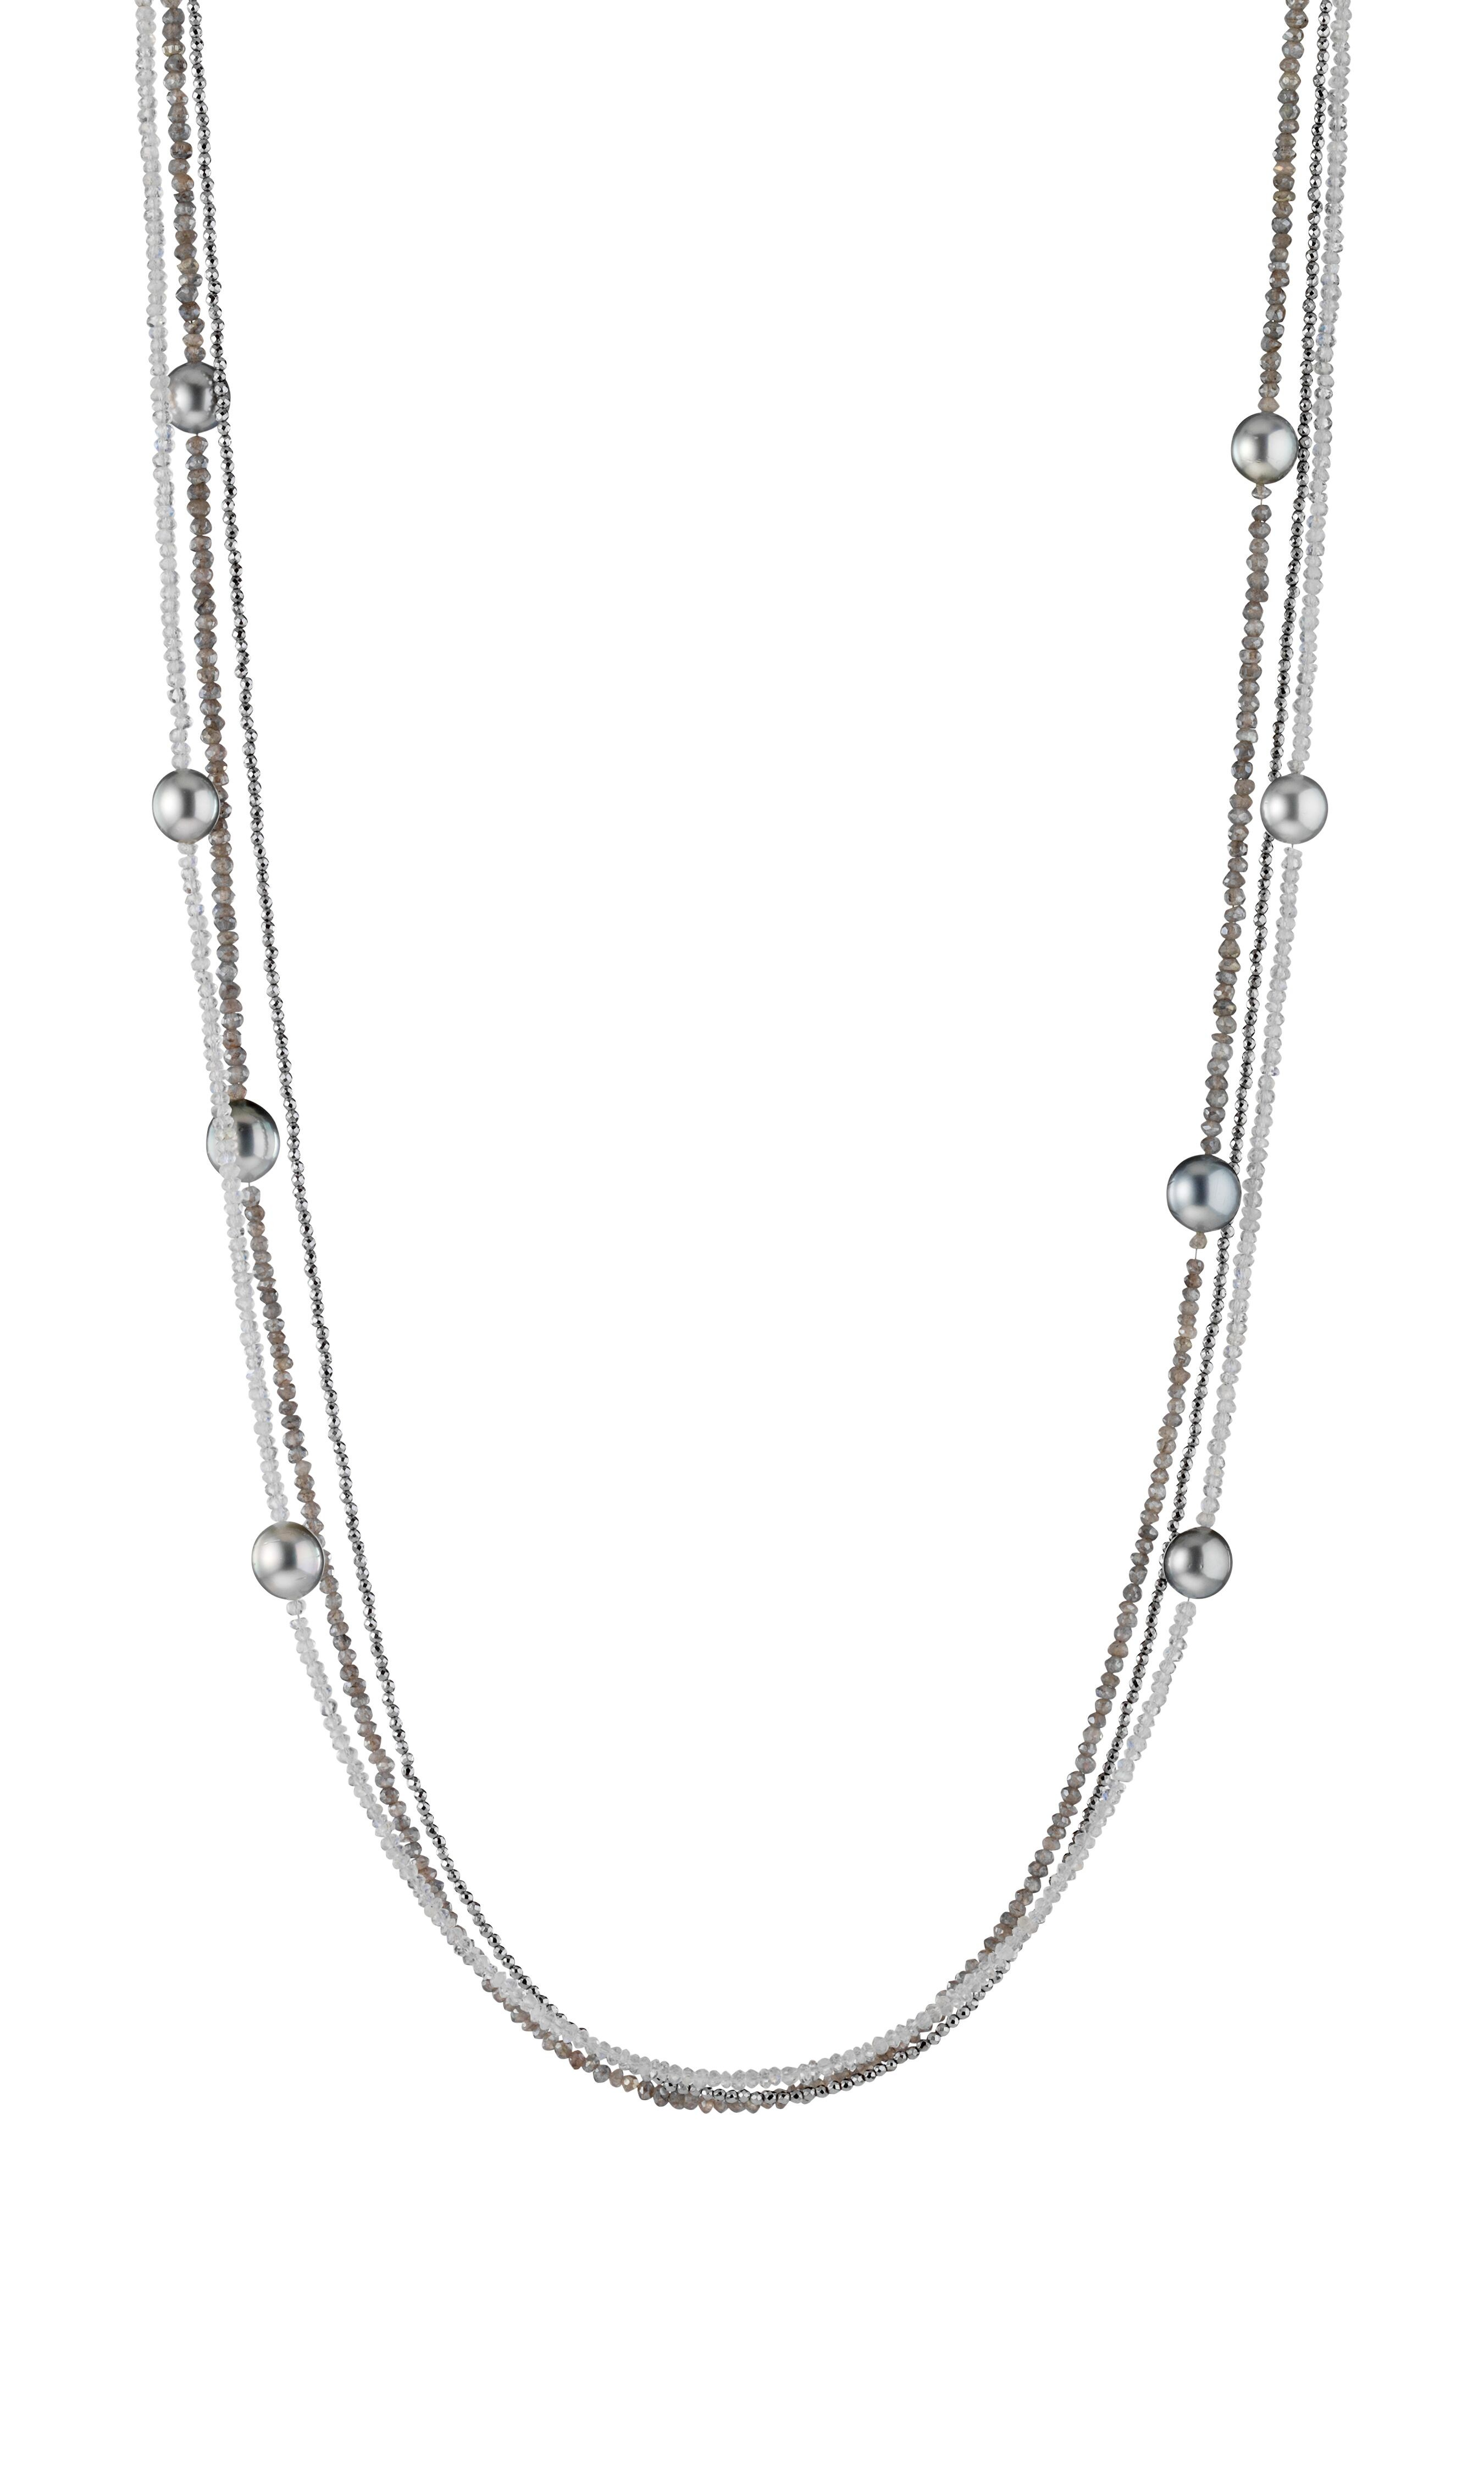 Collier mit Tahiti Silber